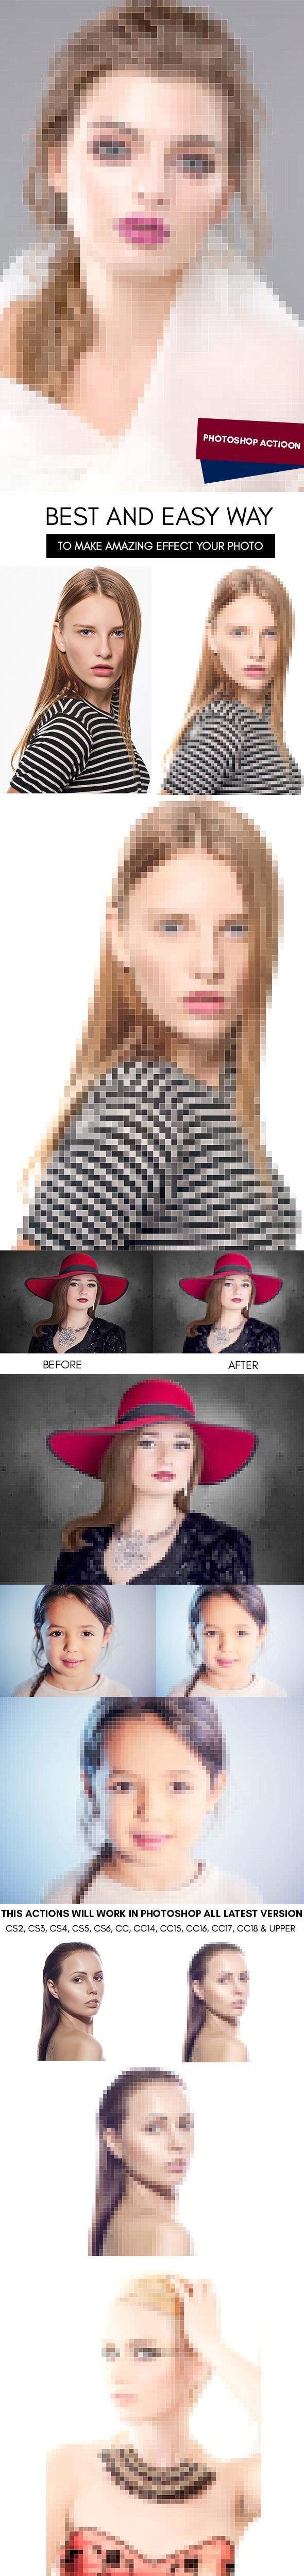 Pixel Art :: Photoshop Action - Photoshop Add-ons